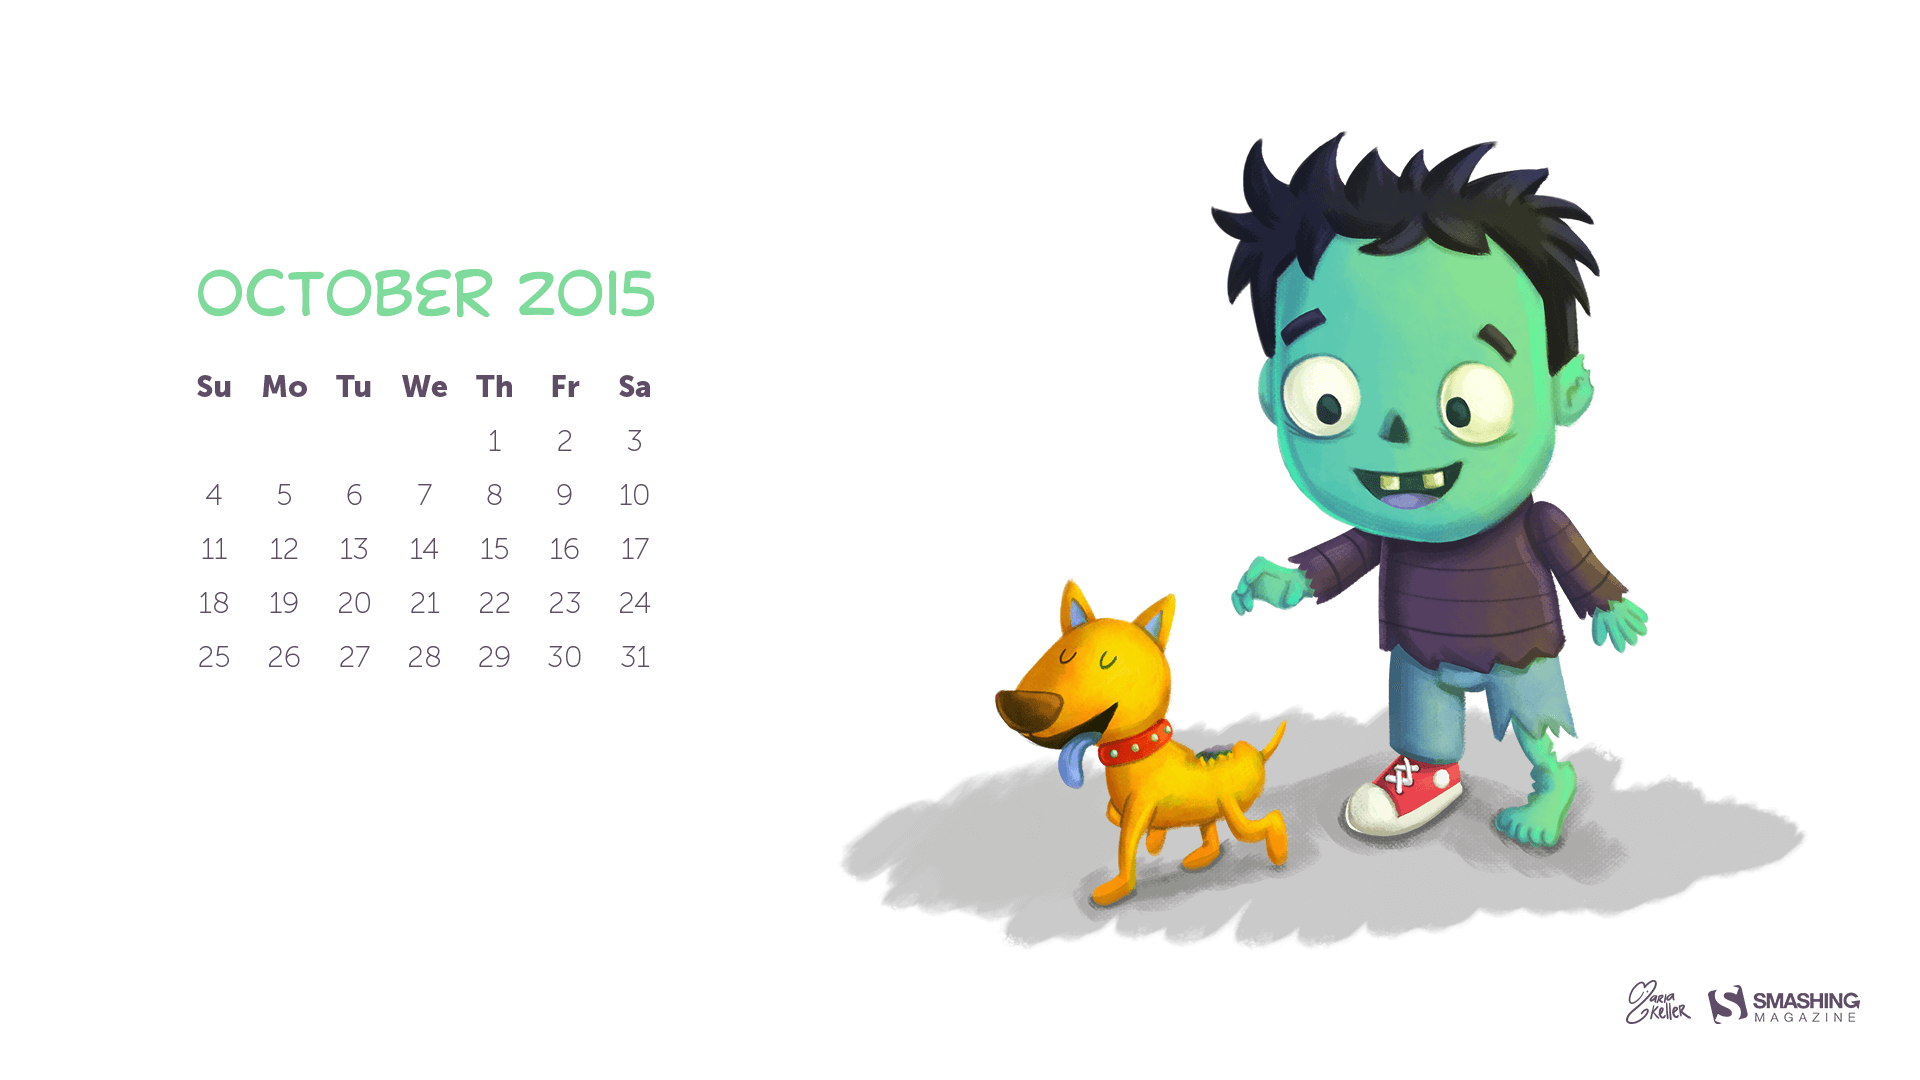 Best Friends Forever Desktop Calendars Wallpapers October 2015 1920x1080